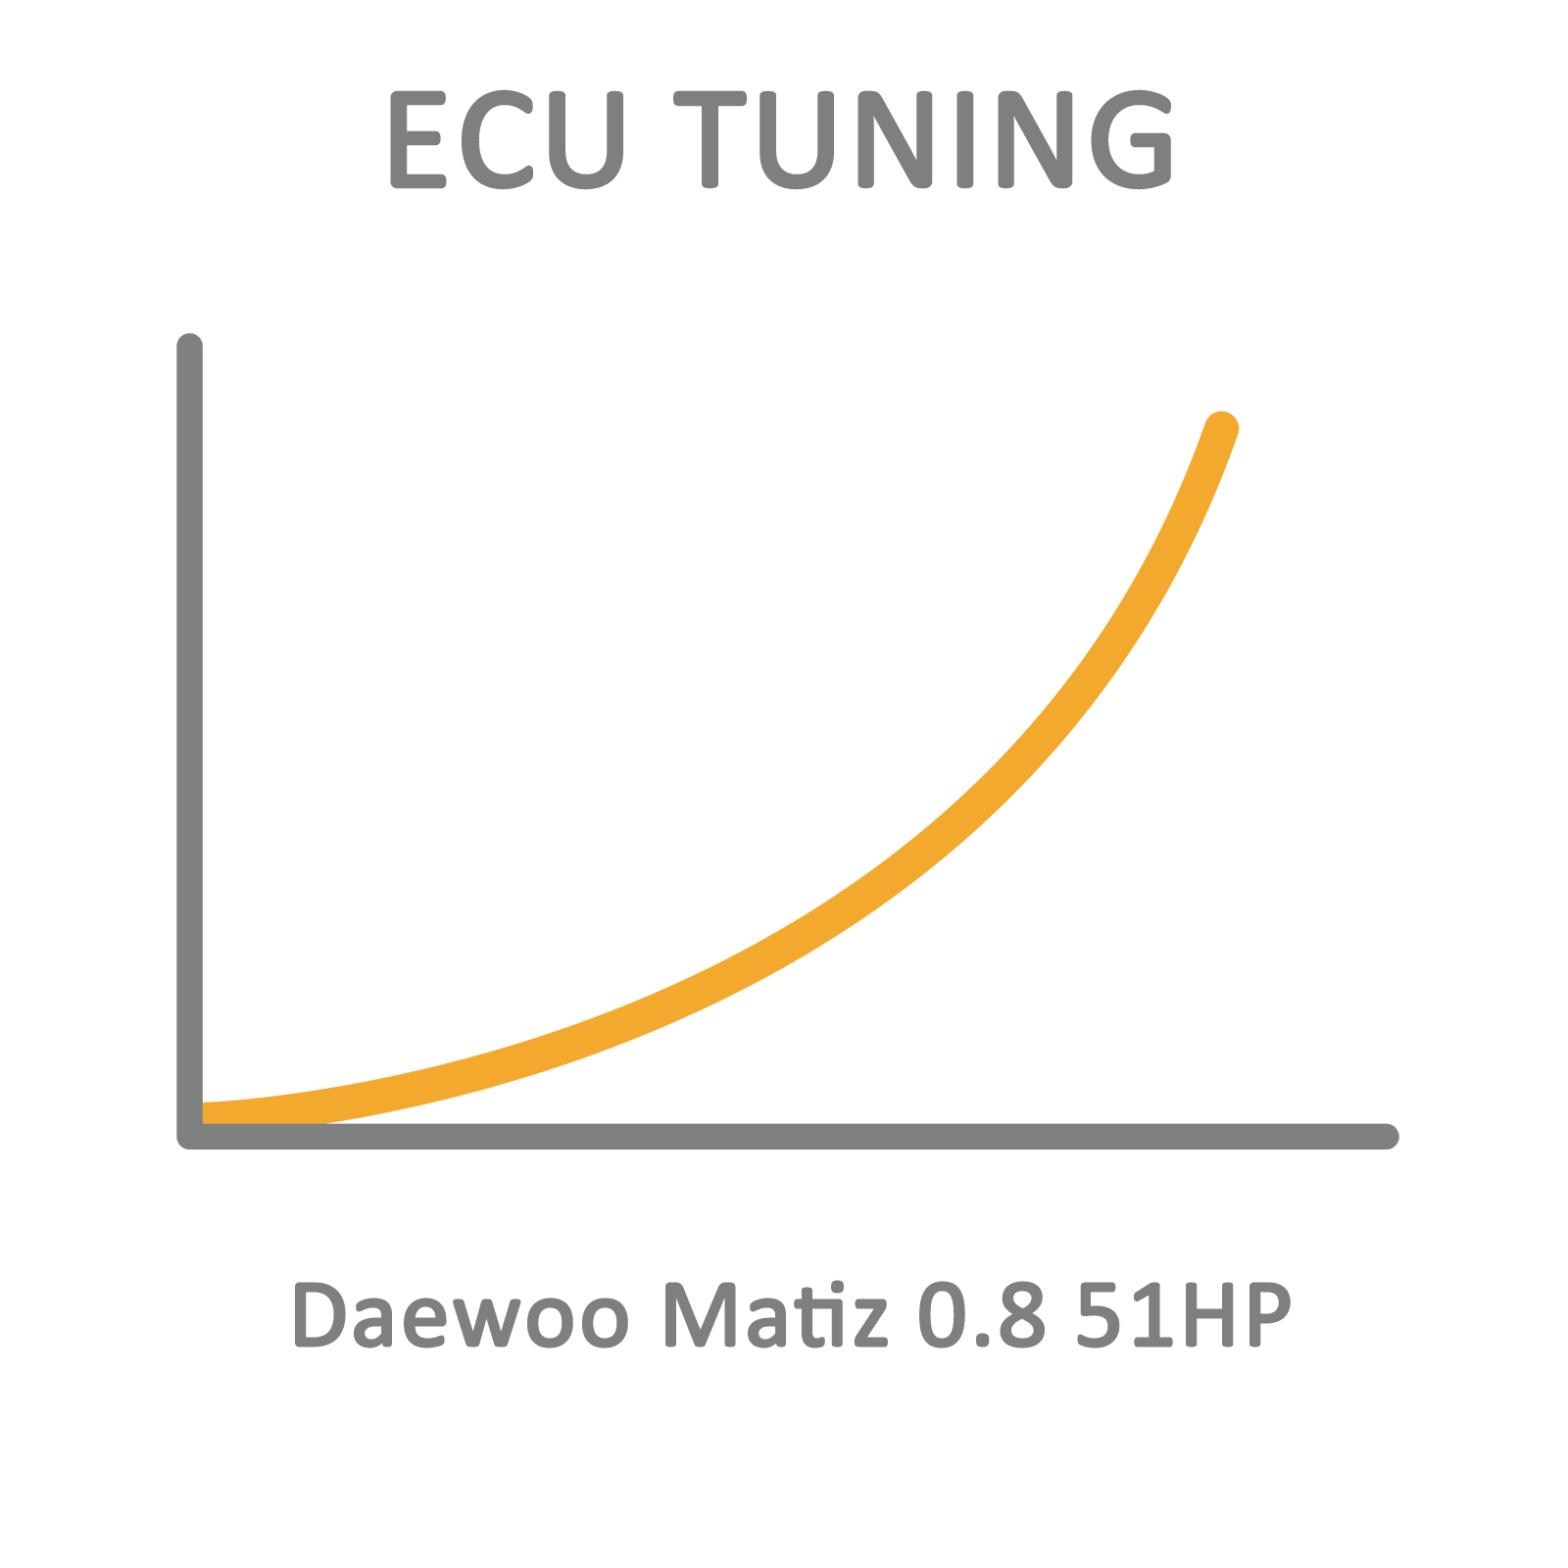 Daewoo Matiz 0.8 51HP ECU Tuning Remapping Programming